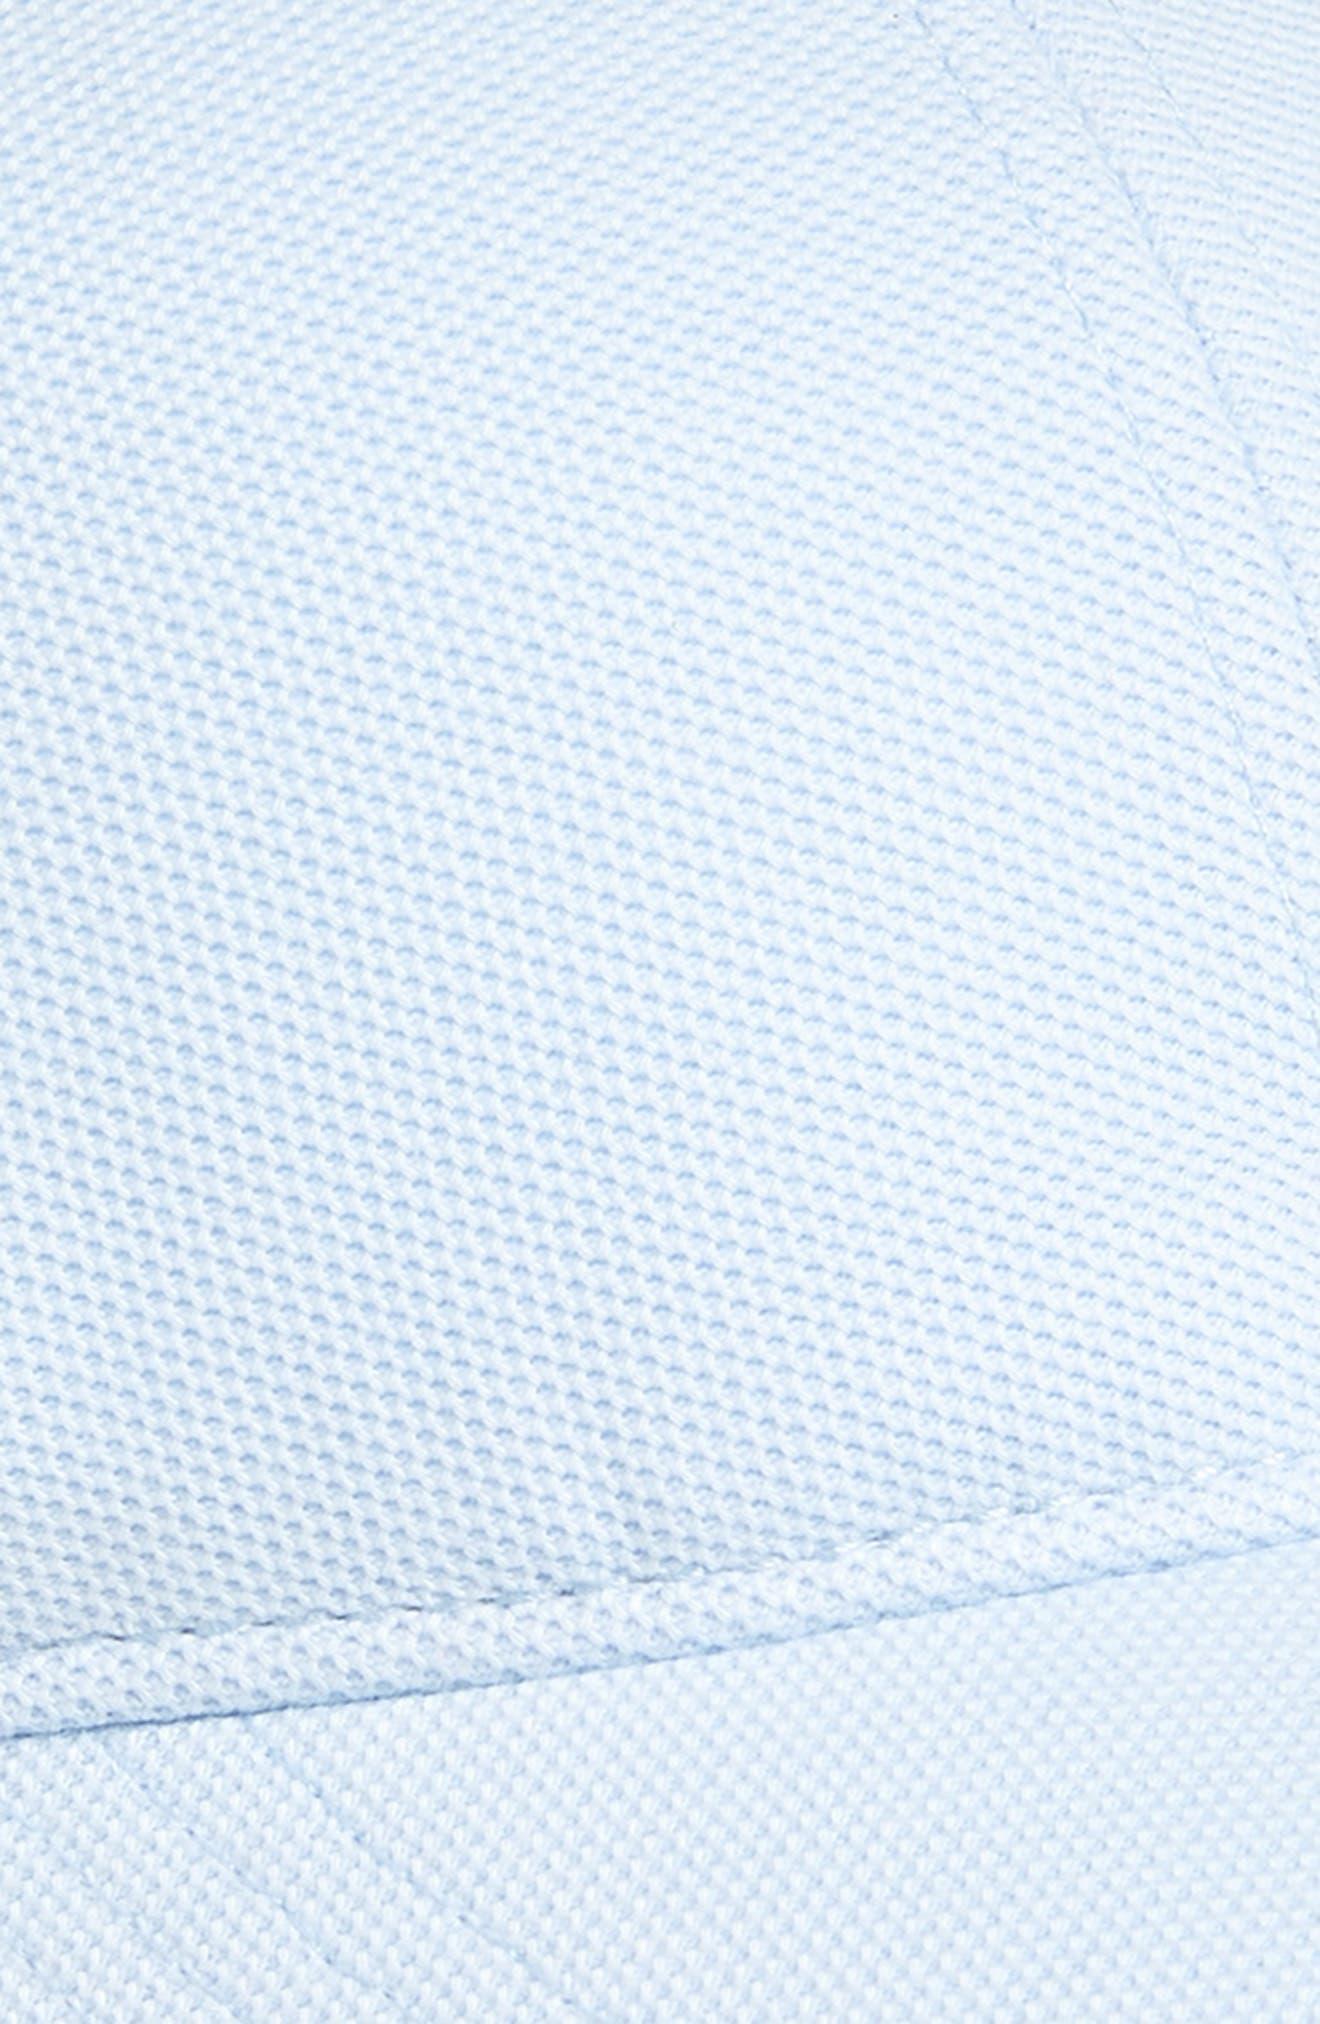 LACOSTE, Croc Cotton Baseball Cap, Alternate thumbnail 3, color, RILL